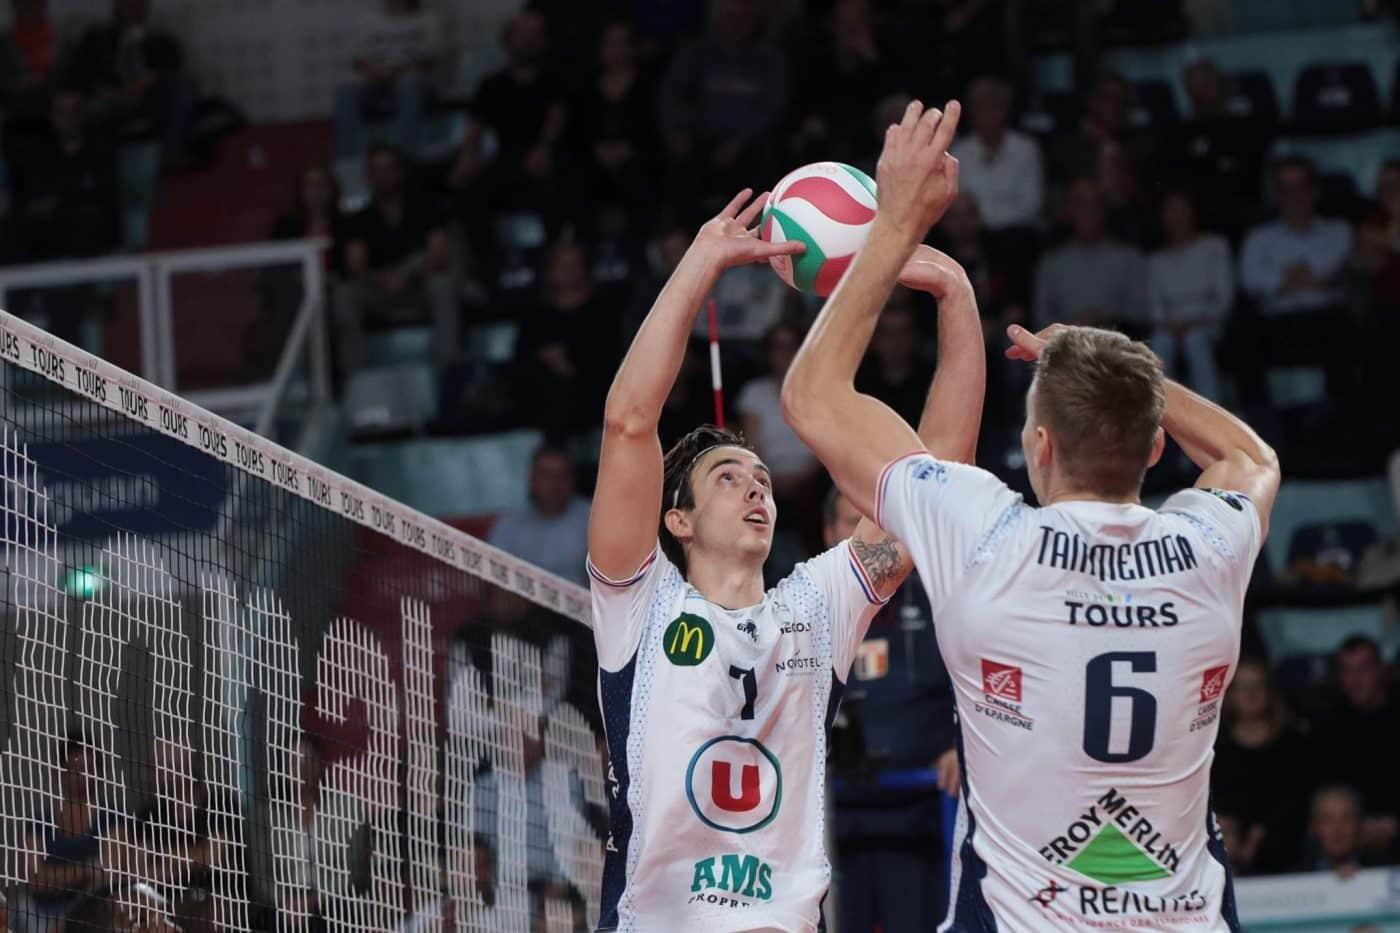 maillot-volley-LAM-2019-2020-tours-errea-3